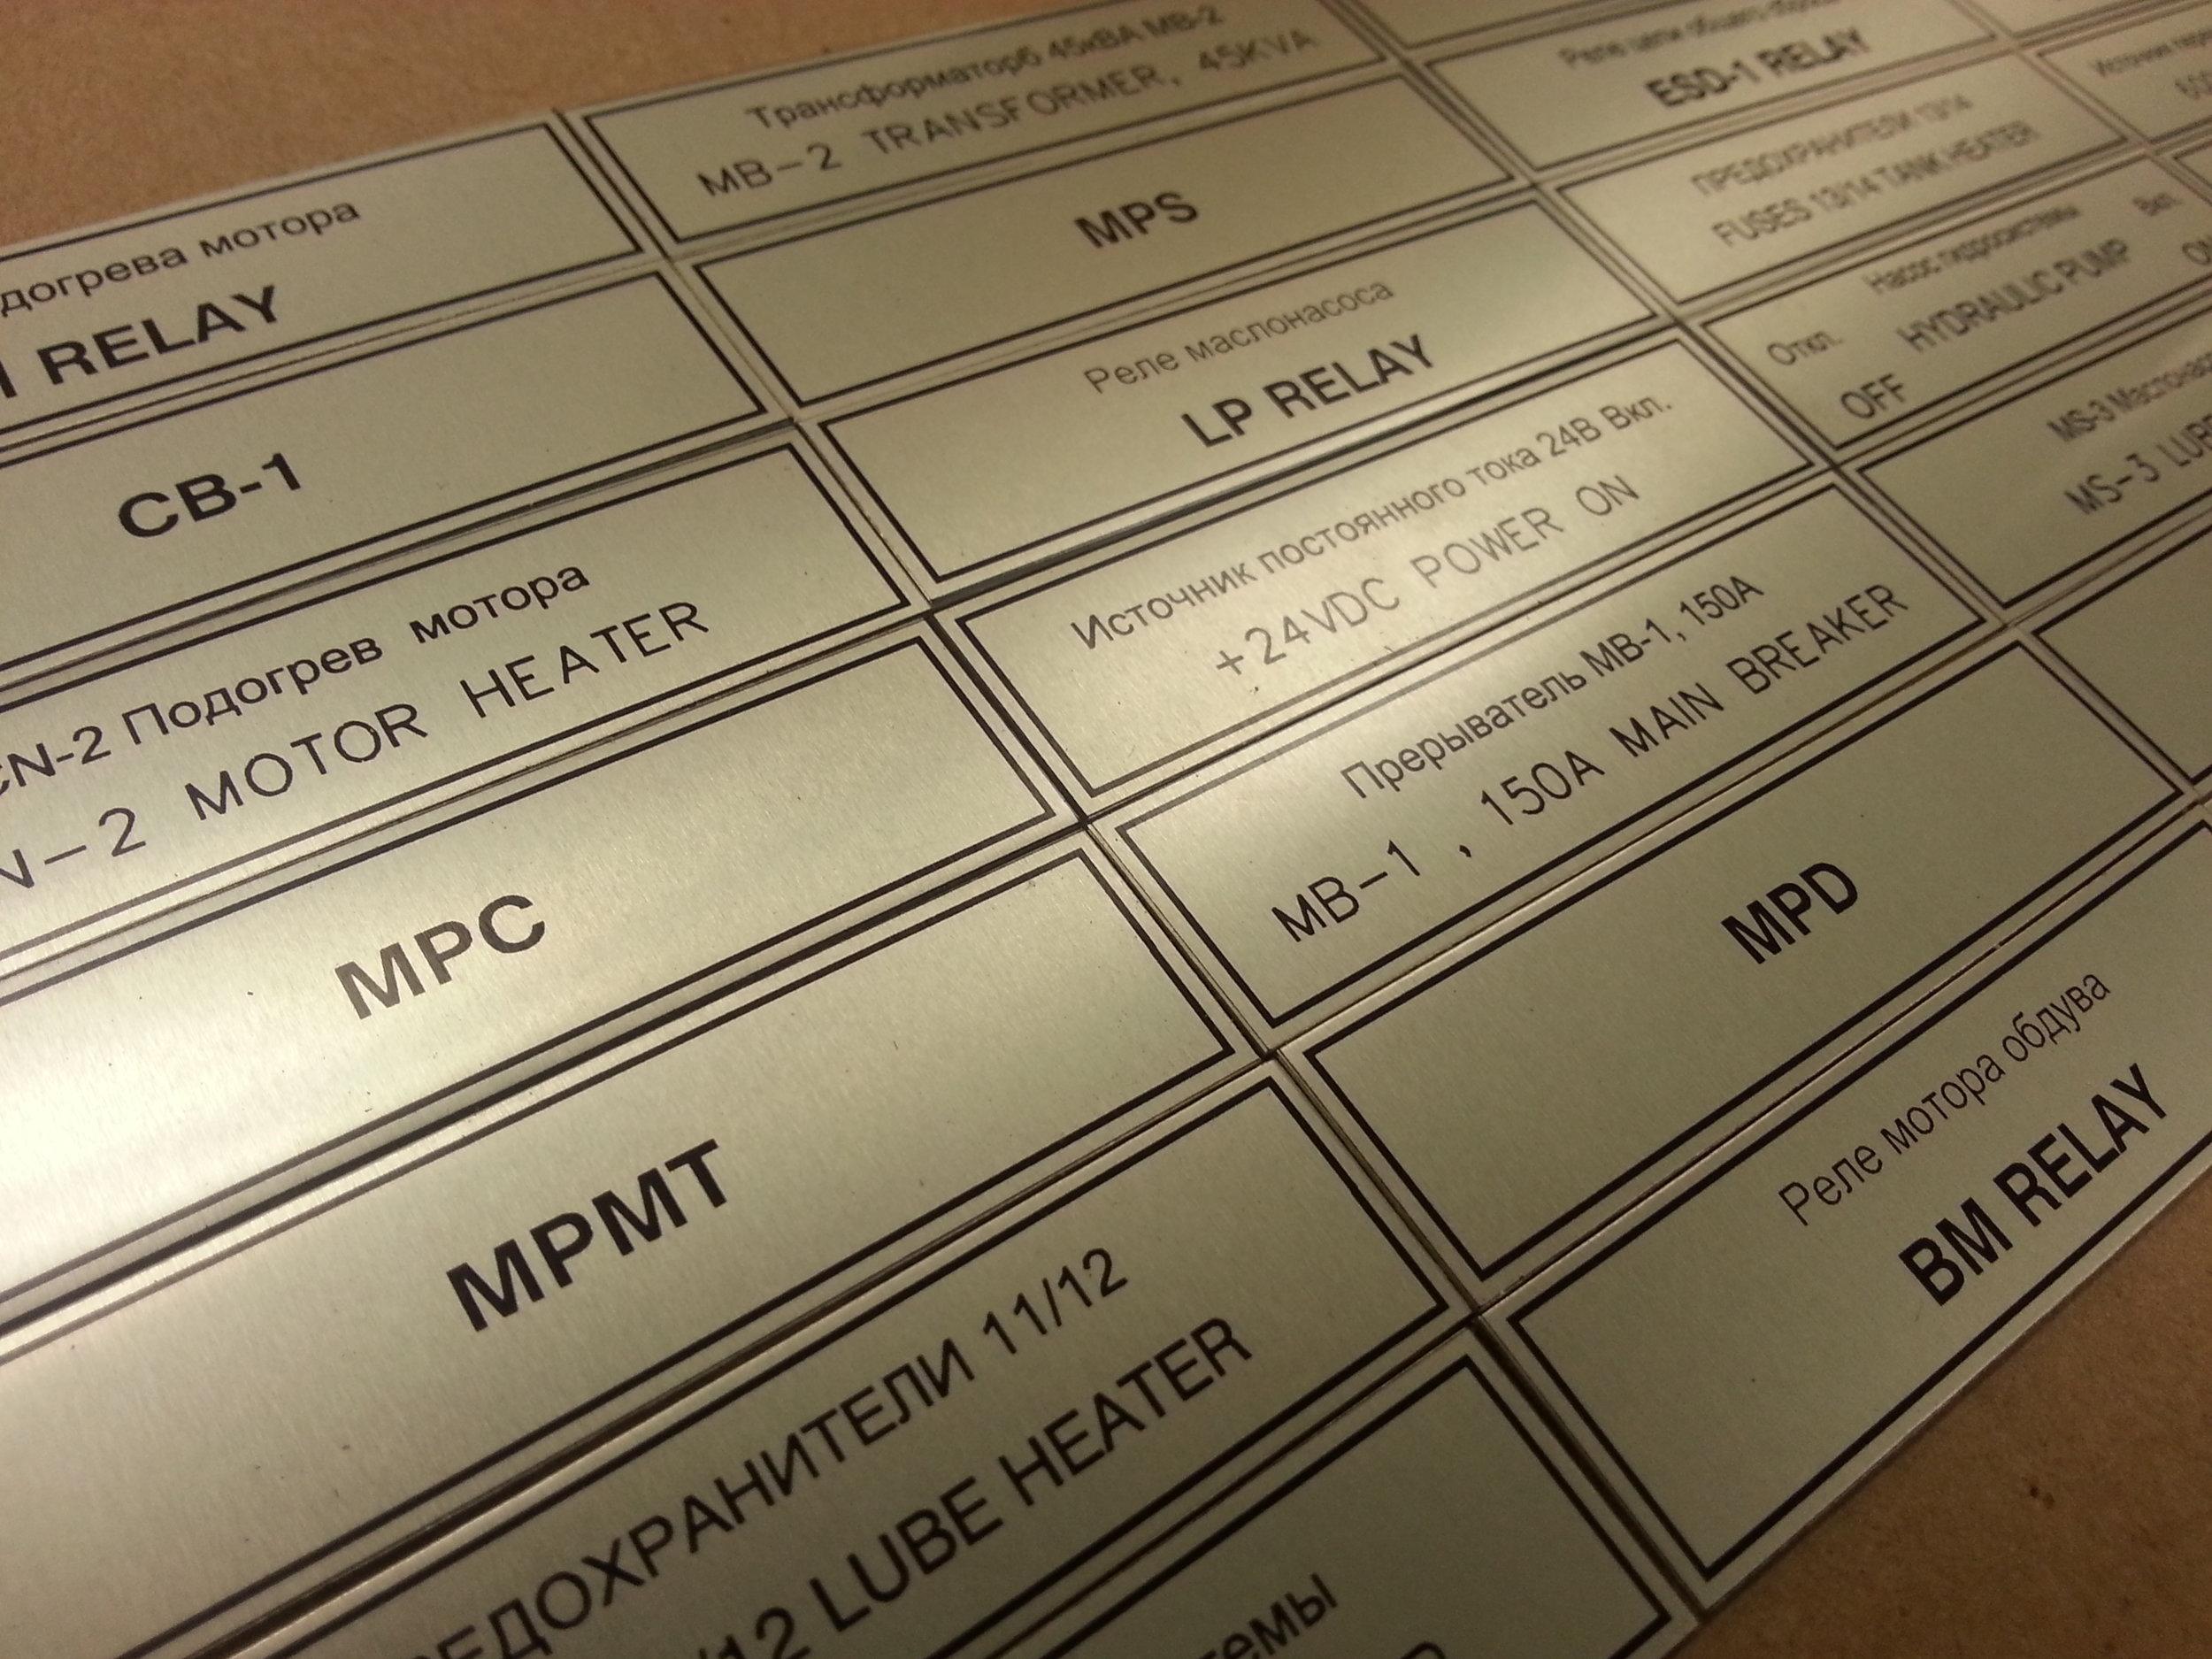 Metalphoto Tags - Aluminum Tags - Metalphoto Plates - Aluminum Plates - Industrial Metalphoto - Industrial Plates - Industrial Tags